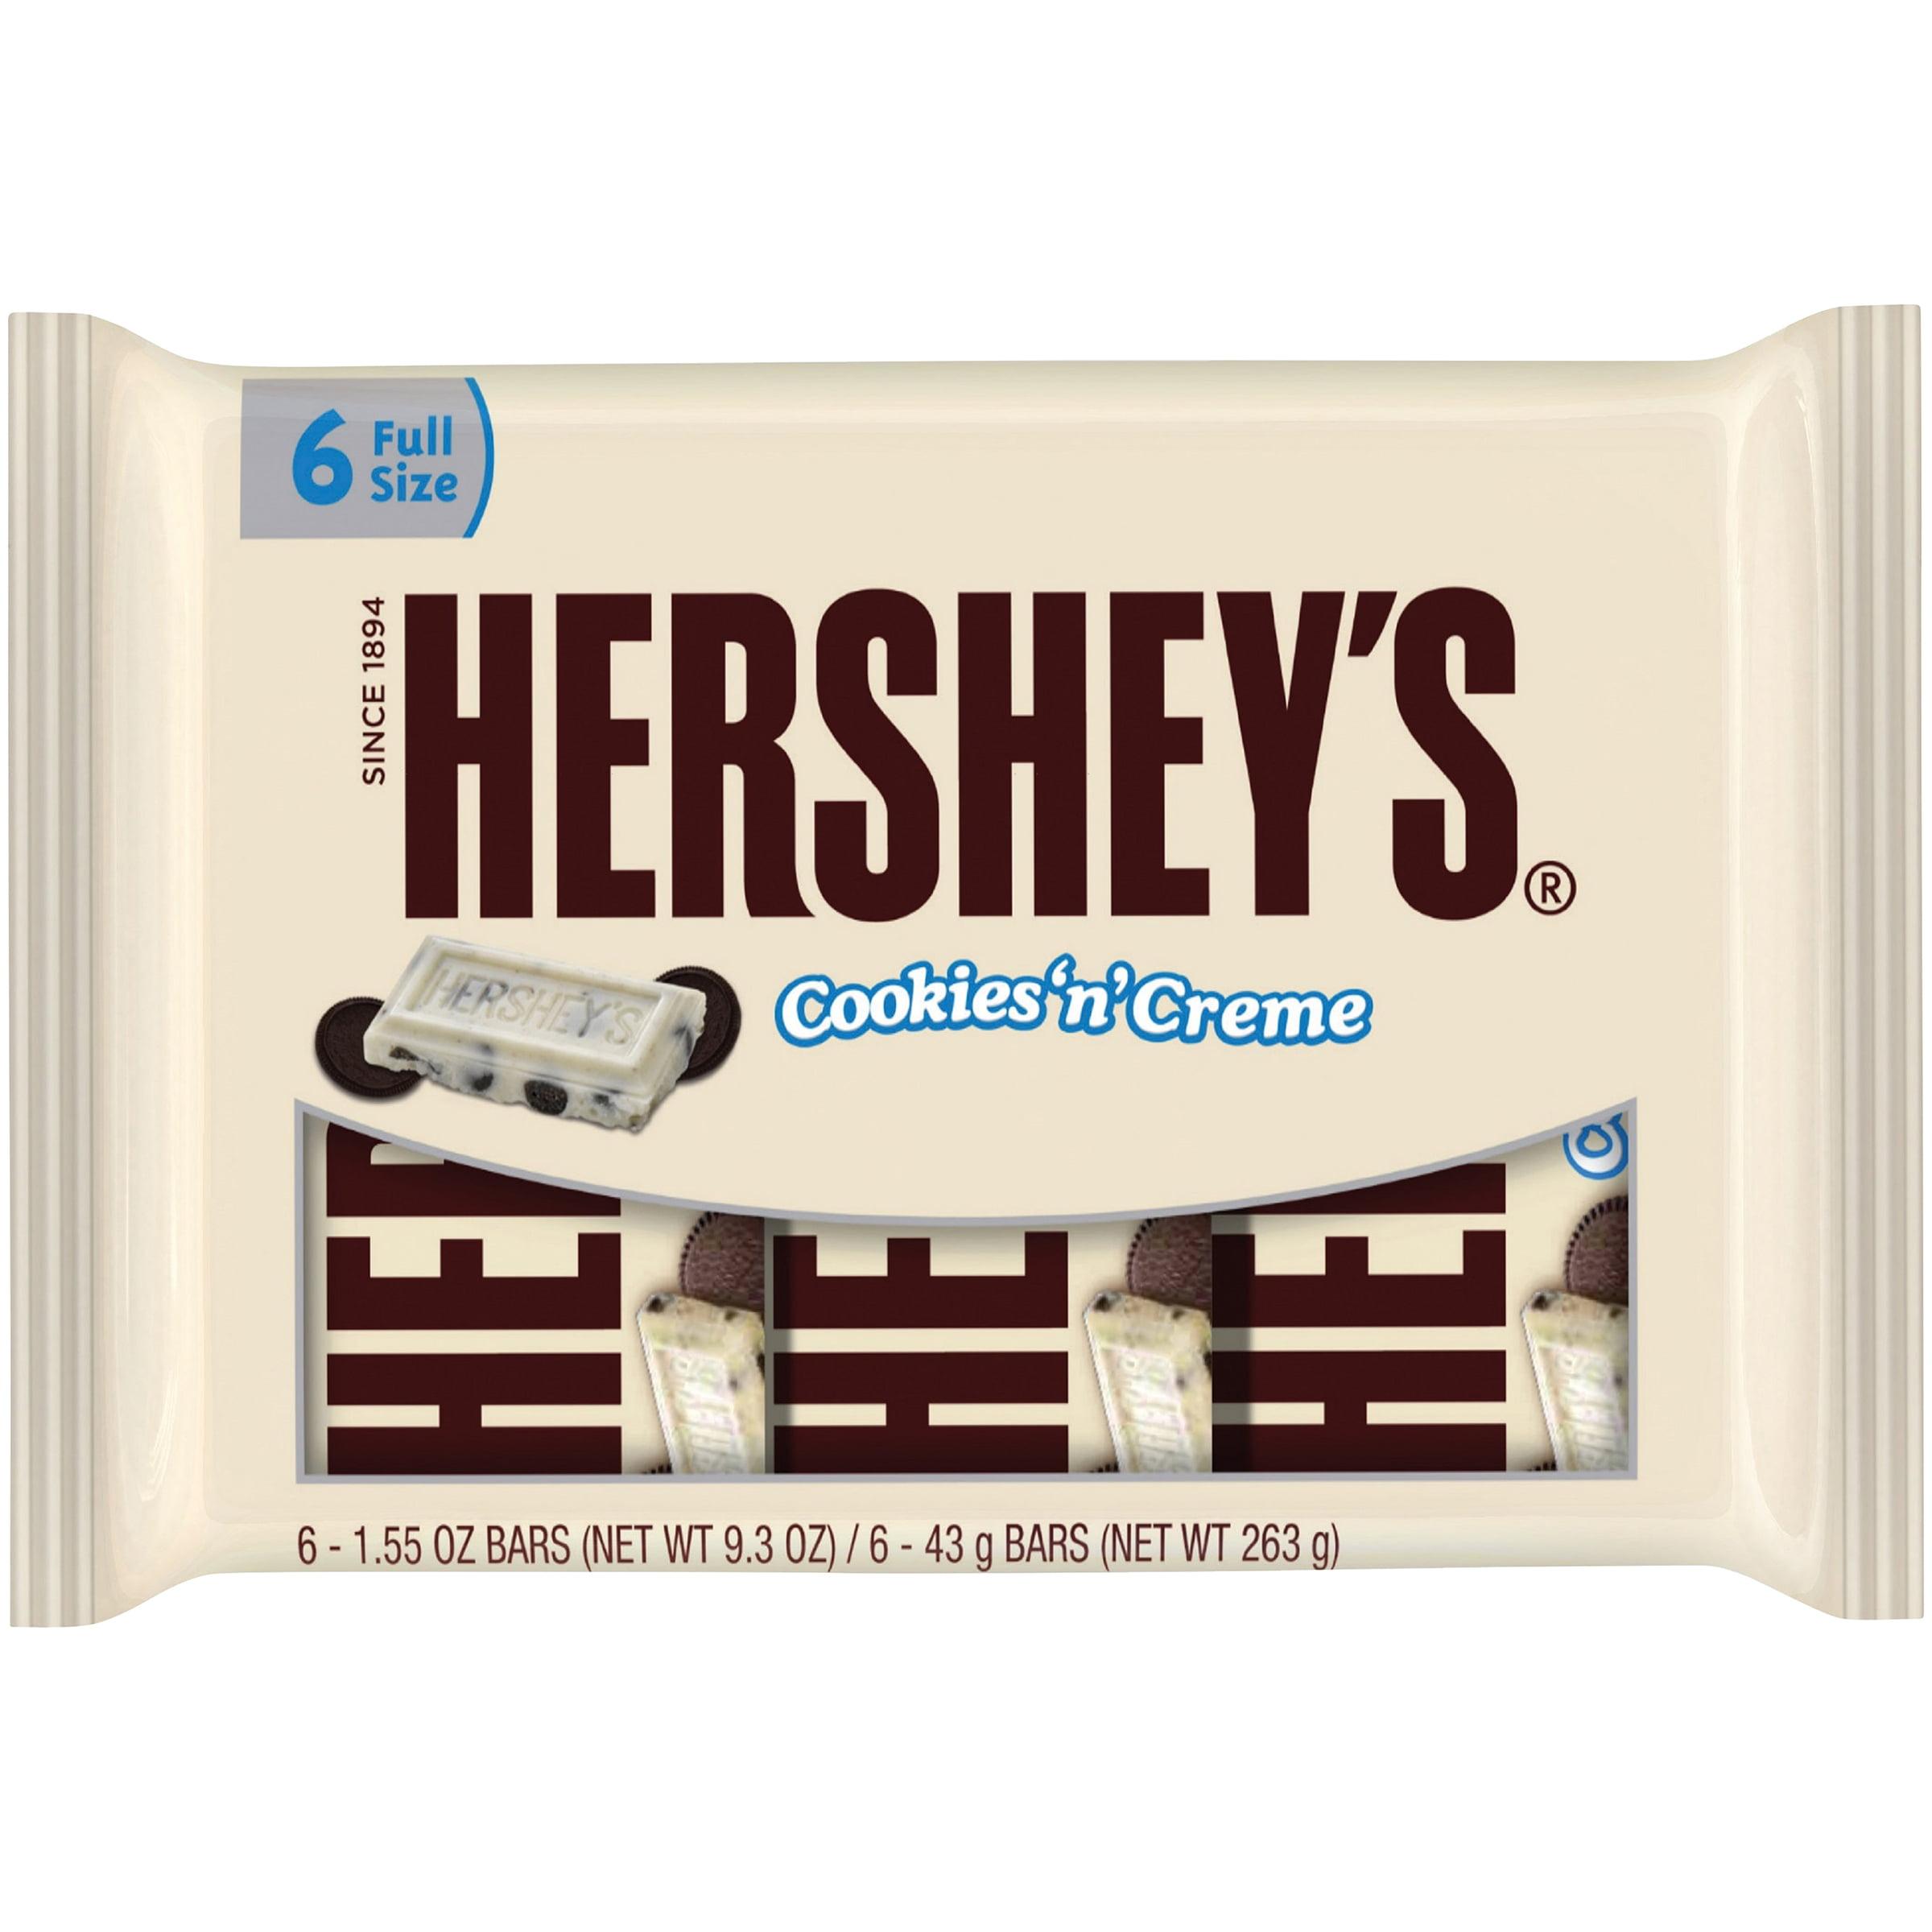 The Hershey Company Hersheyâ S � Cookies â Nâ Creme Candy Bars 6 - 1.55 Oz. Bars